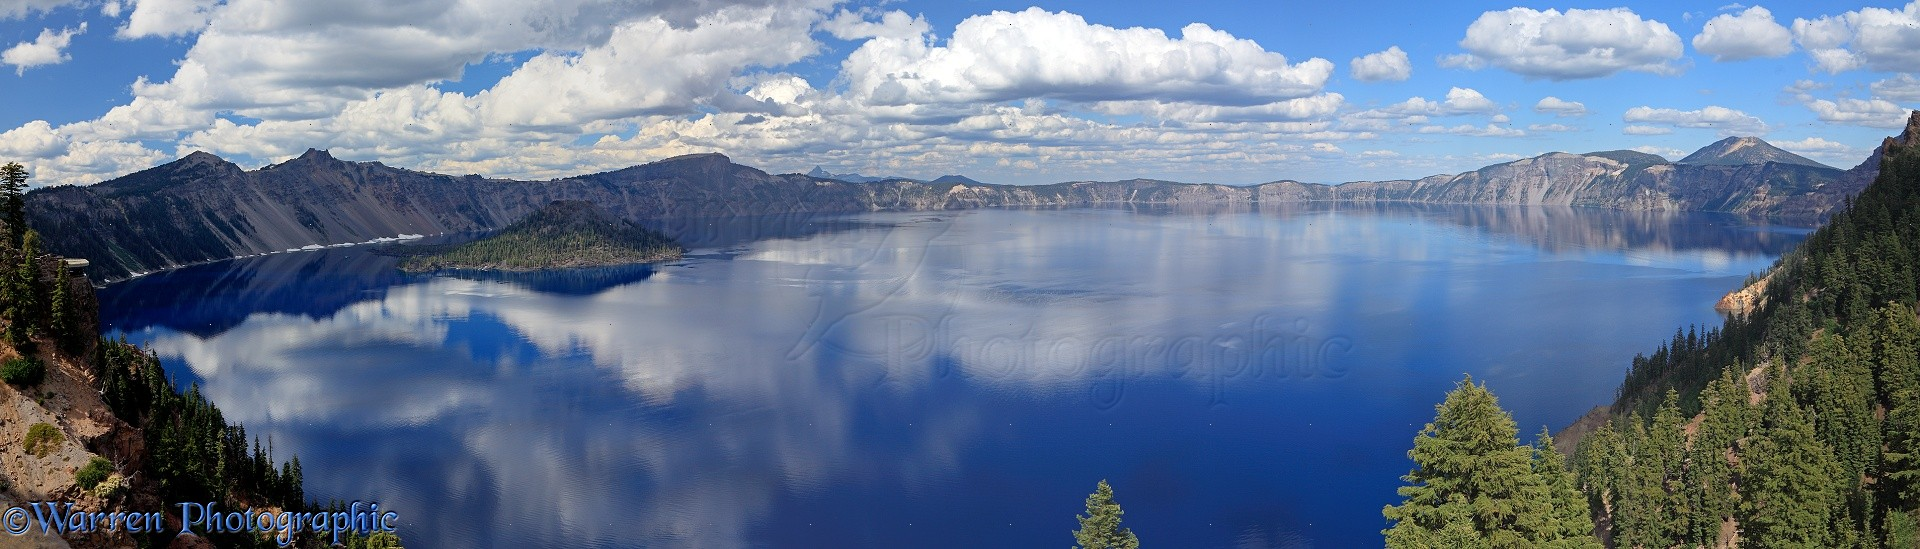 Crater Lake Panoramic View Photo Wp36612